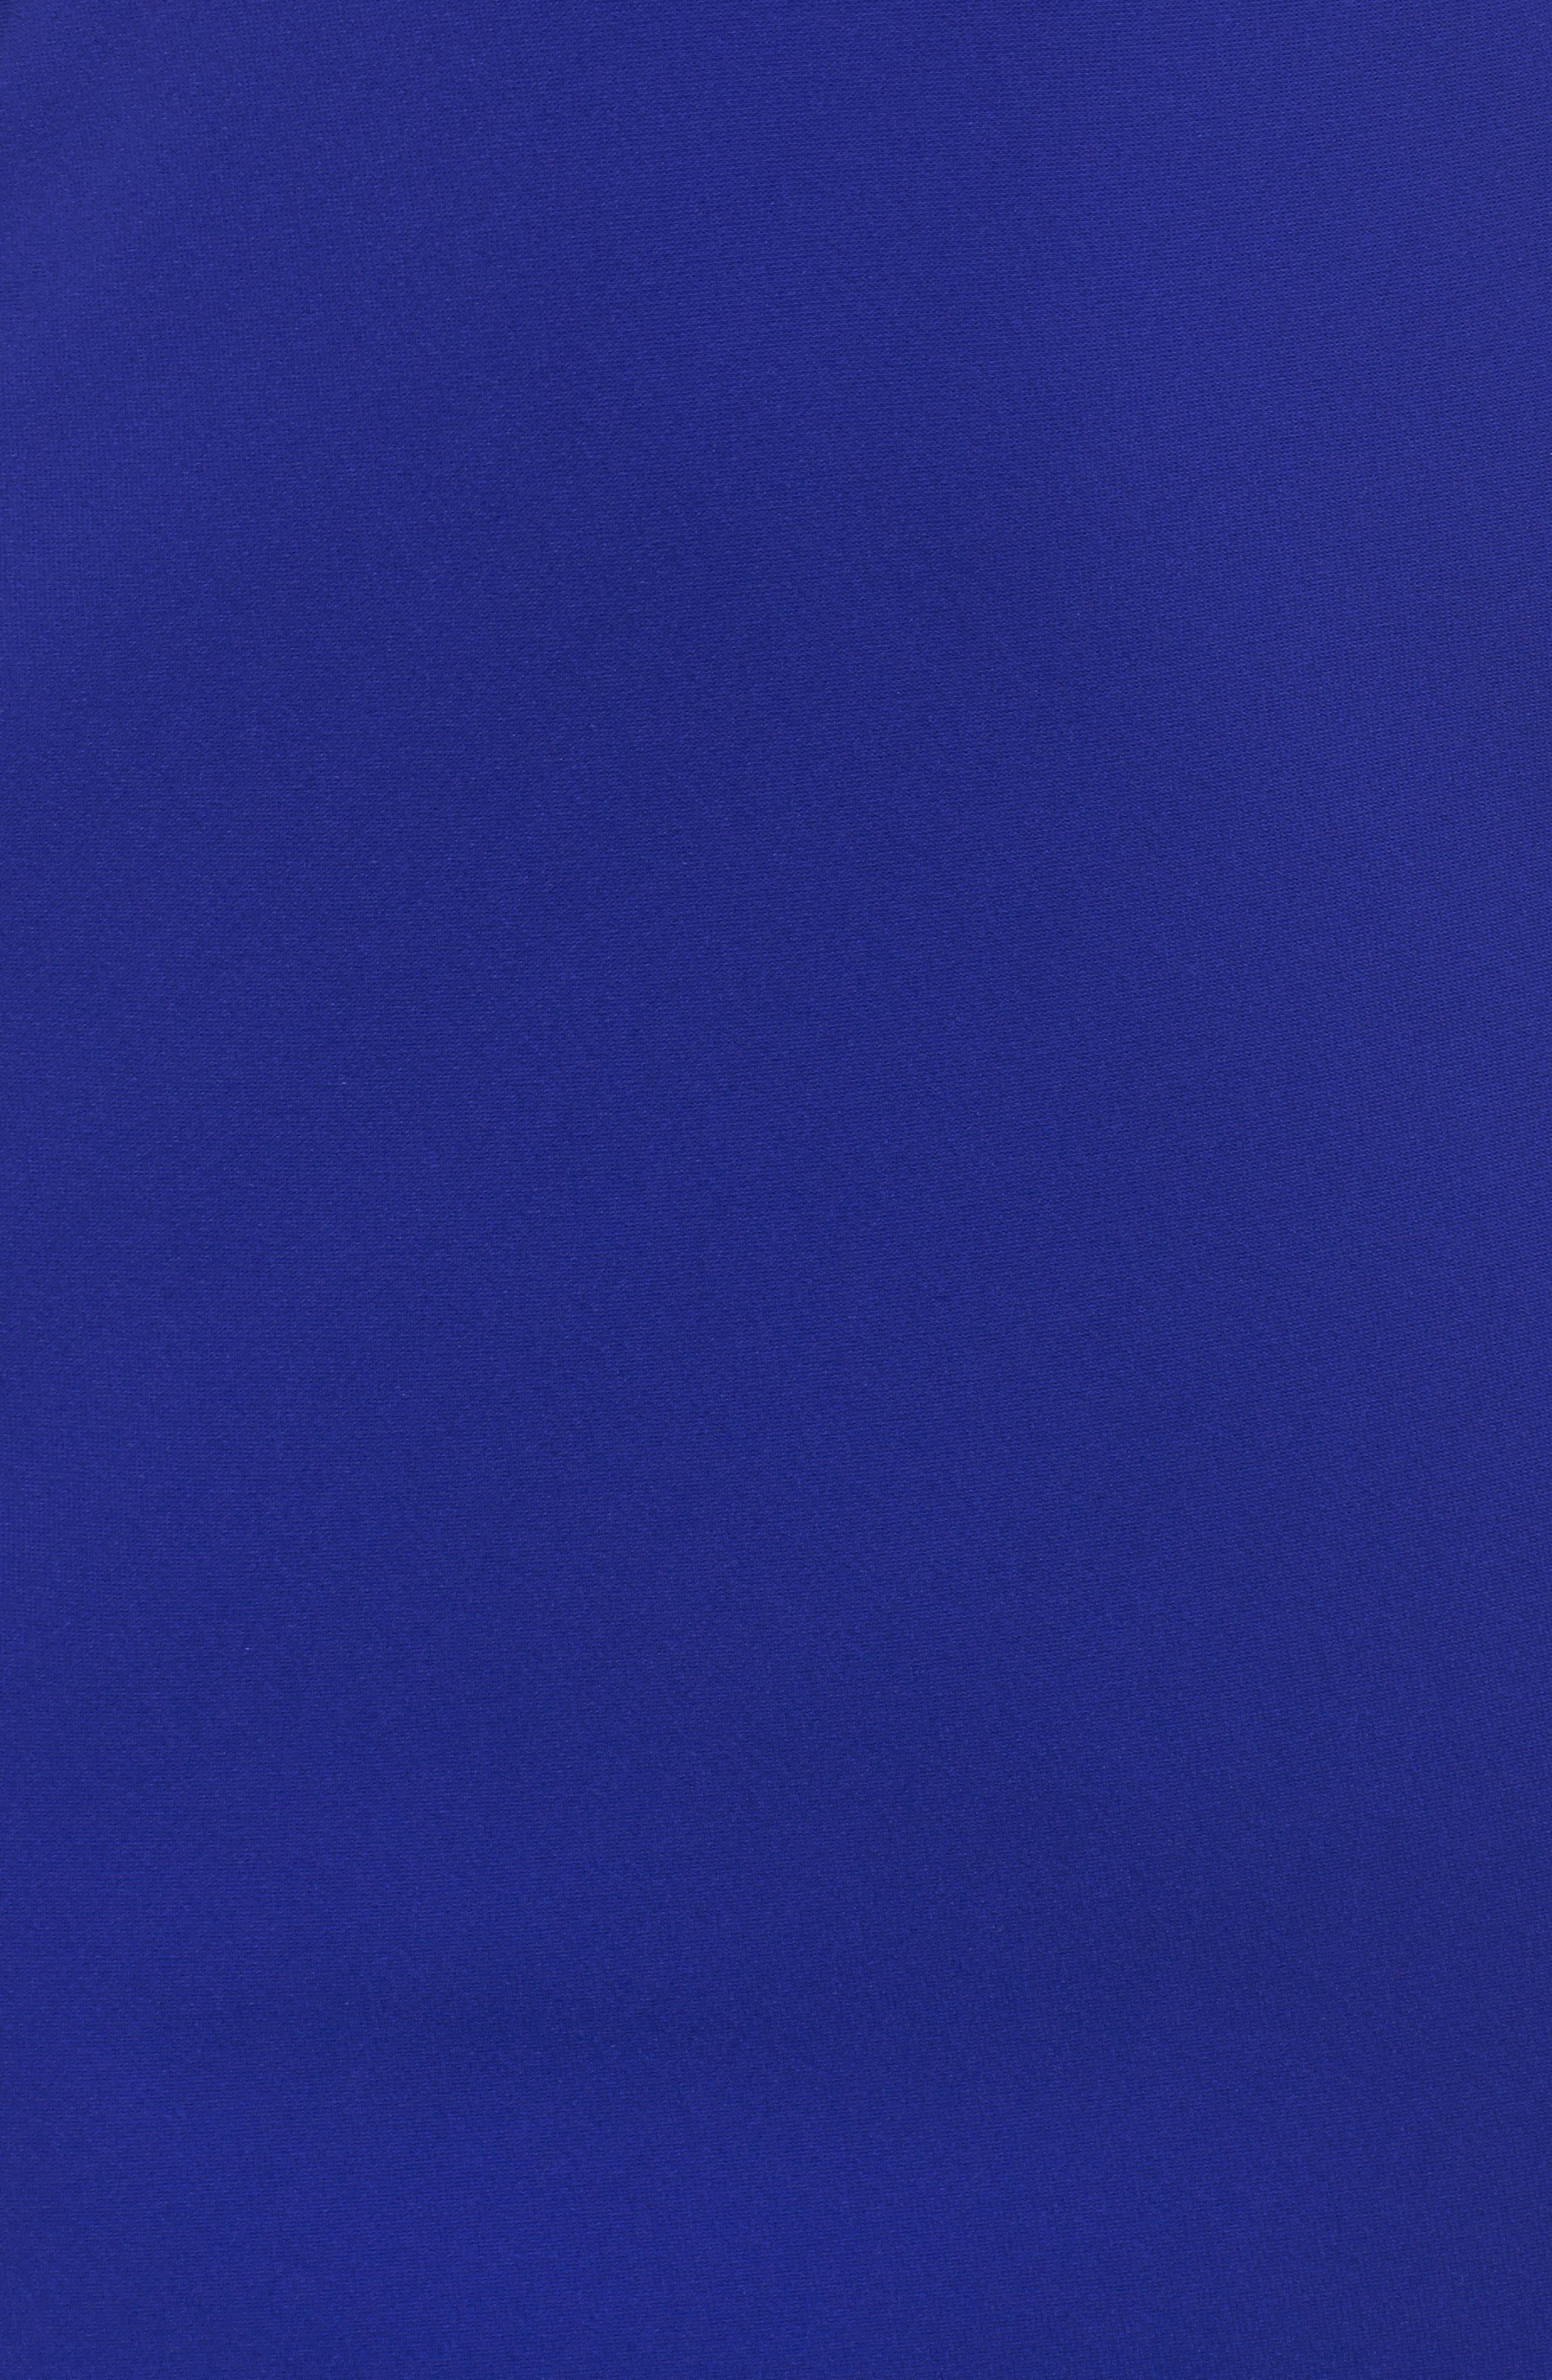 Open Back Halter Gown,                             Alternate thumbnail 5, color,                             425